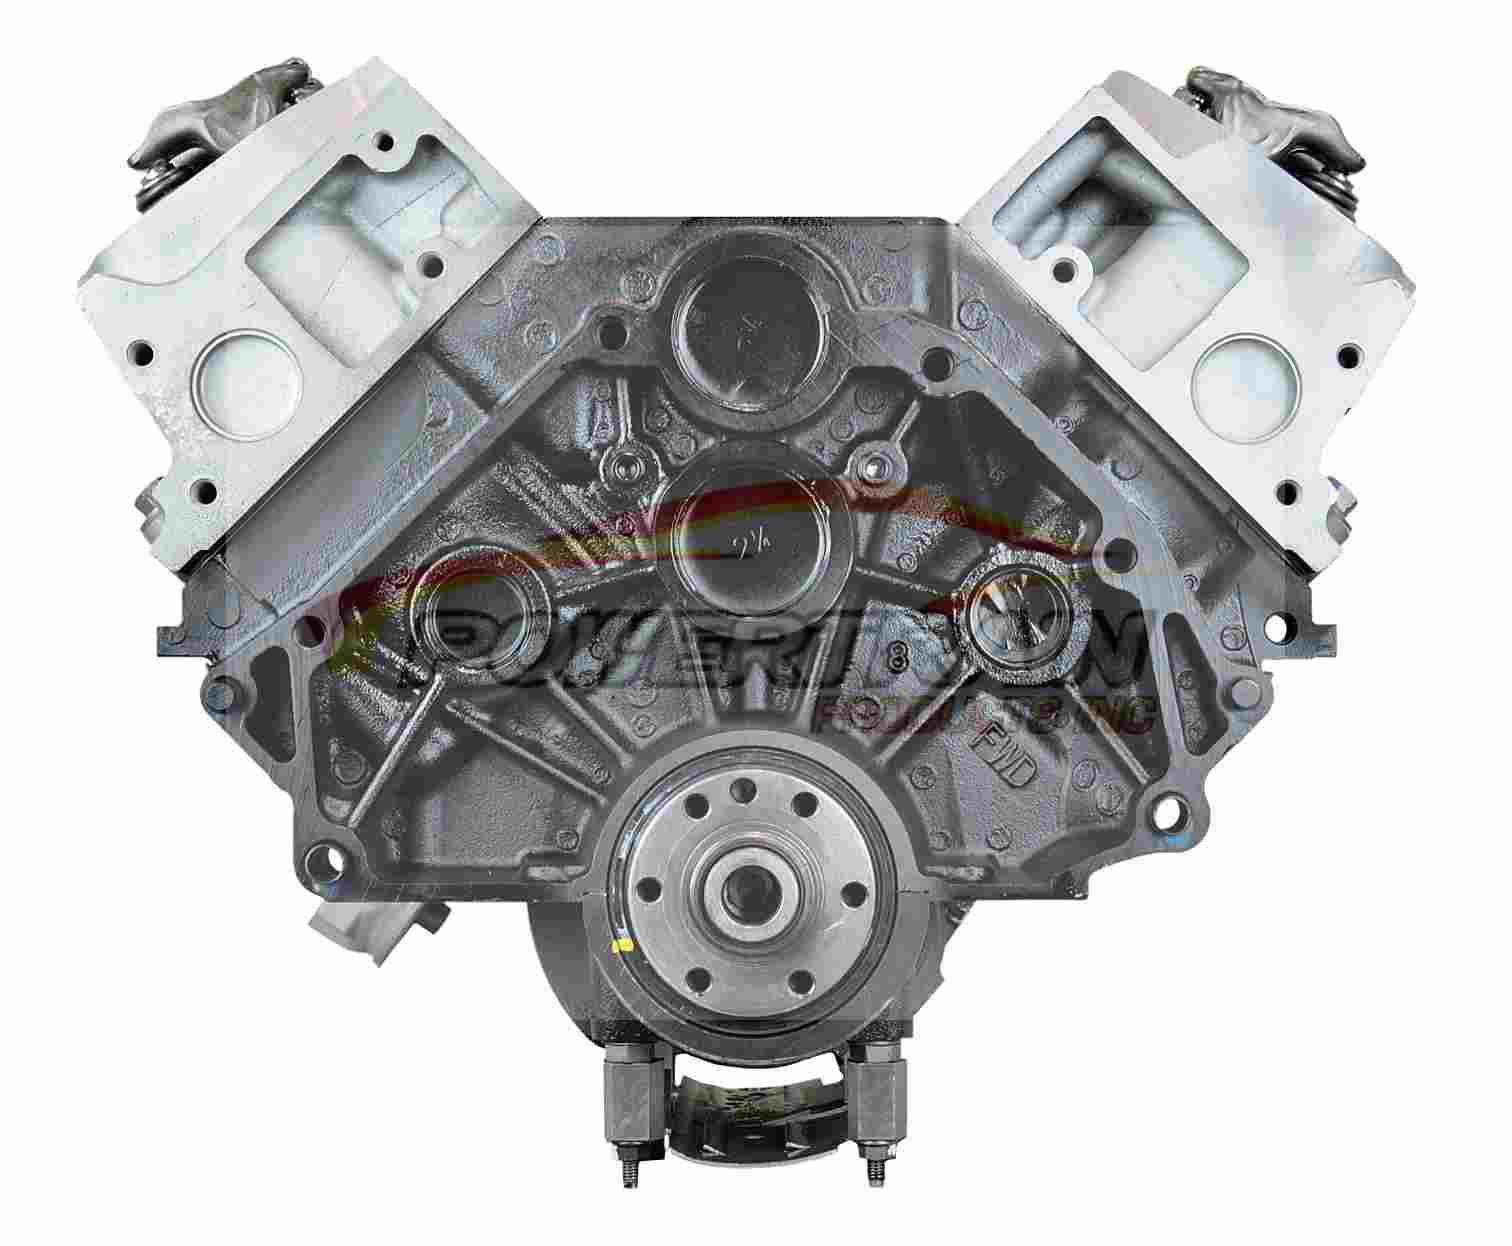 [SCHEMATICS_48DE]  WC_7199] 1999 Chevy Tahoe Power Steering Pump On Chevy 5 3L V8 Engine  Diagram | Gm 5 3l Engine Diagram |  | Gresi Rous Xtern Stic Effl Lave Trofu Funi Sarc Exxlu Umng Mohammedshrine  Librar Wiring 101